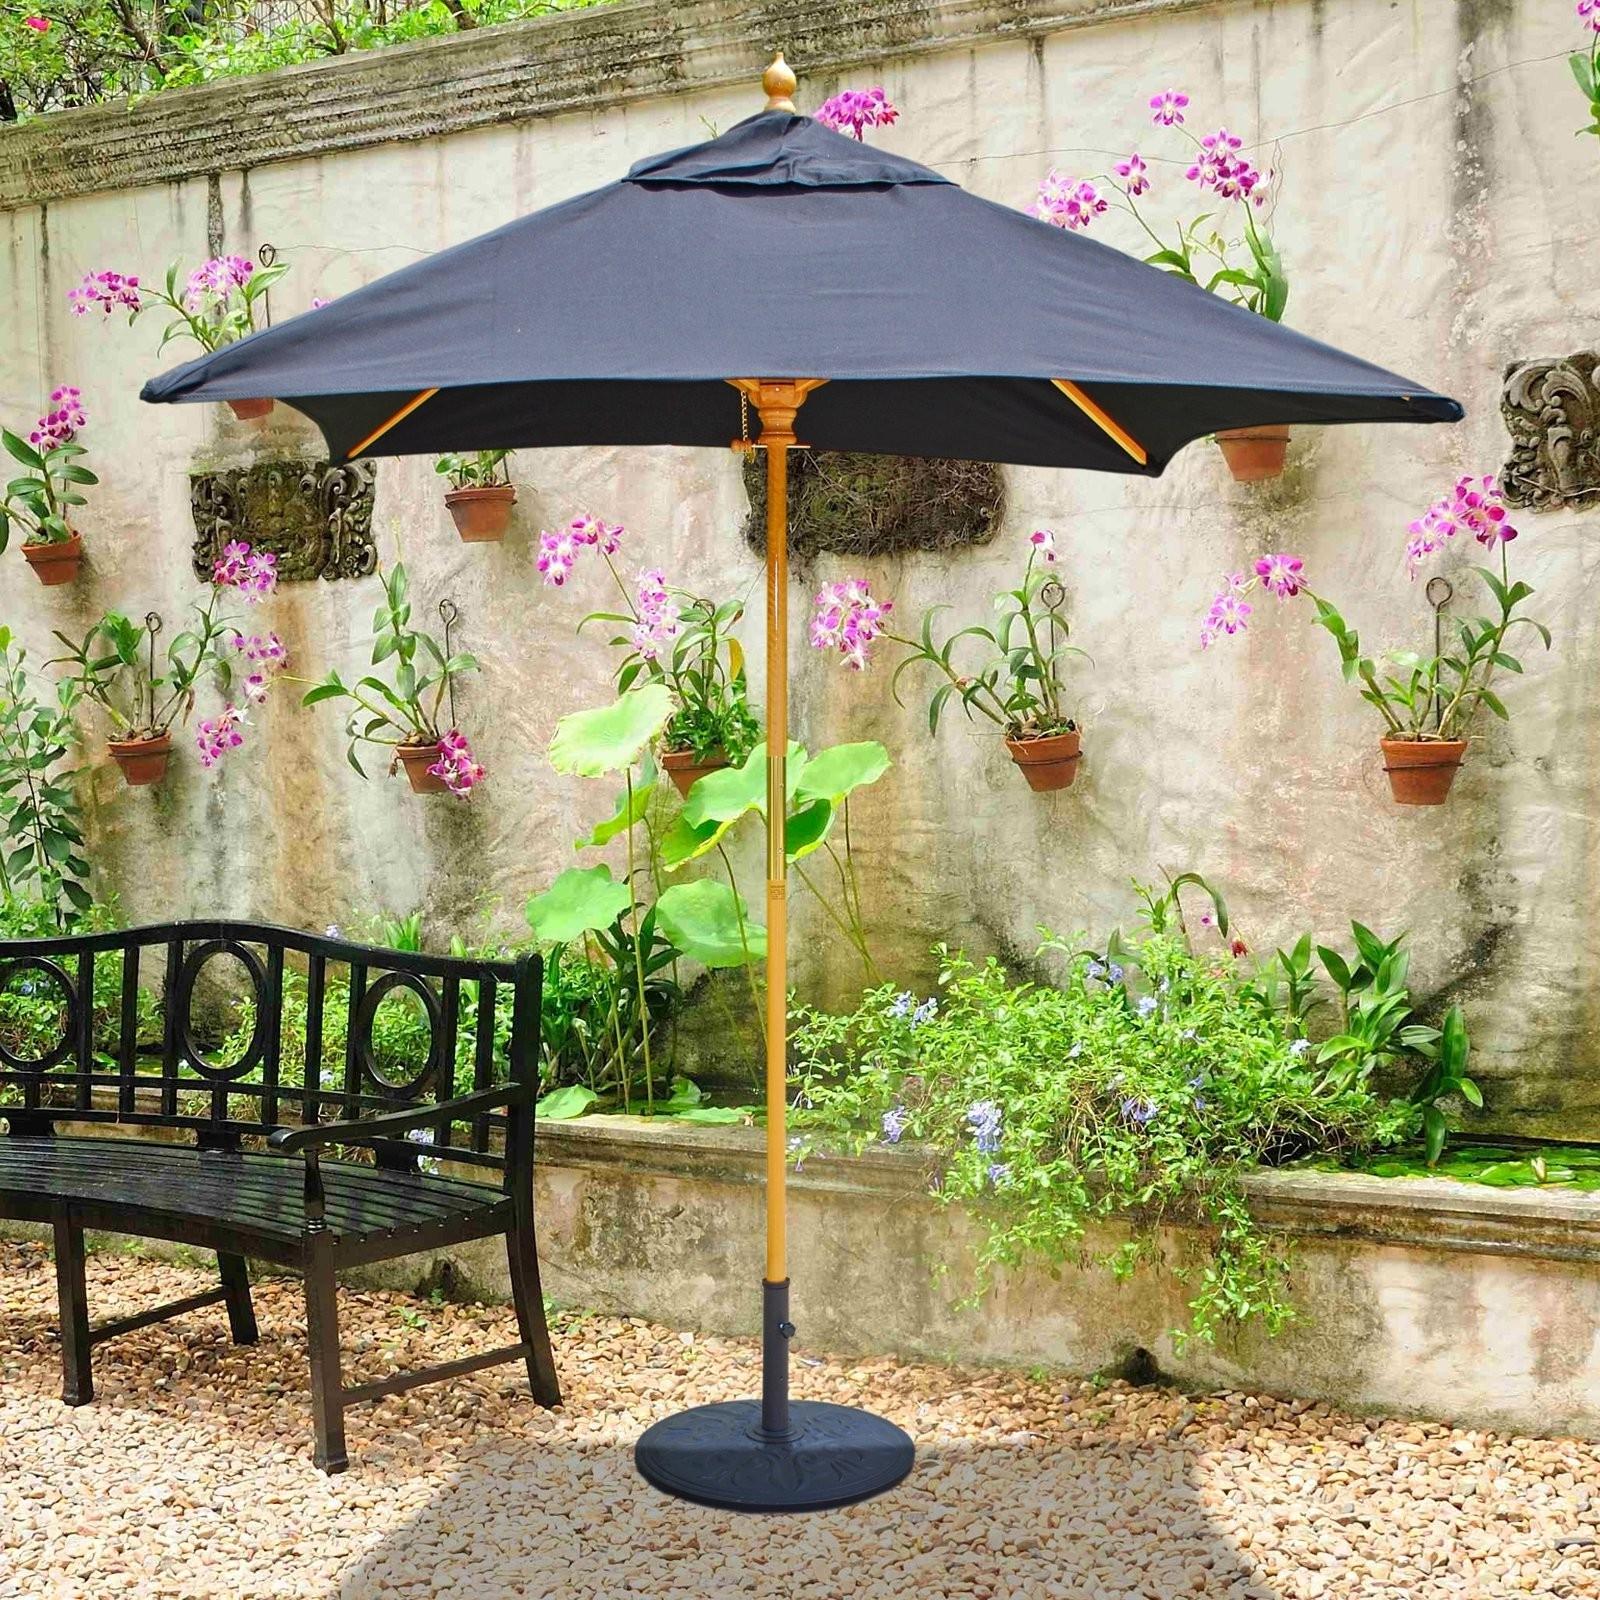 Galtech Sunbrella 6 X 6 Ft Wood Square Patio Umbrella Patio Throughout Recent 6 Ft Patio Umbrellas (View 19 of 20)